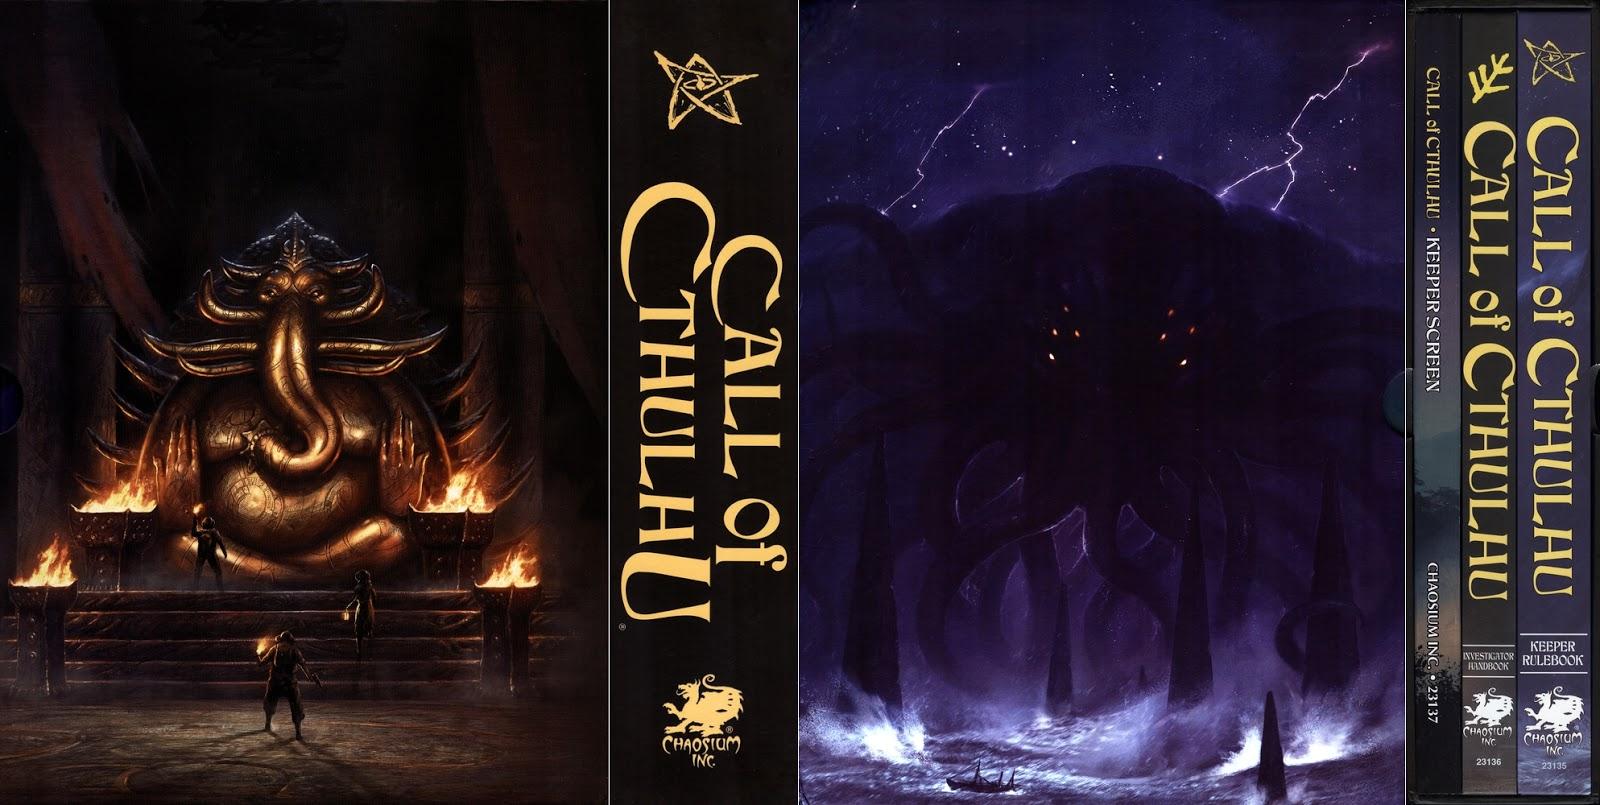 call of cthulhu rpg 7th edition pdf